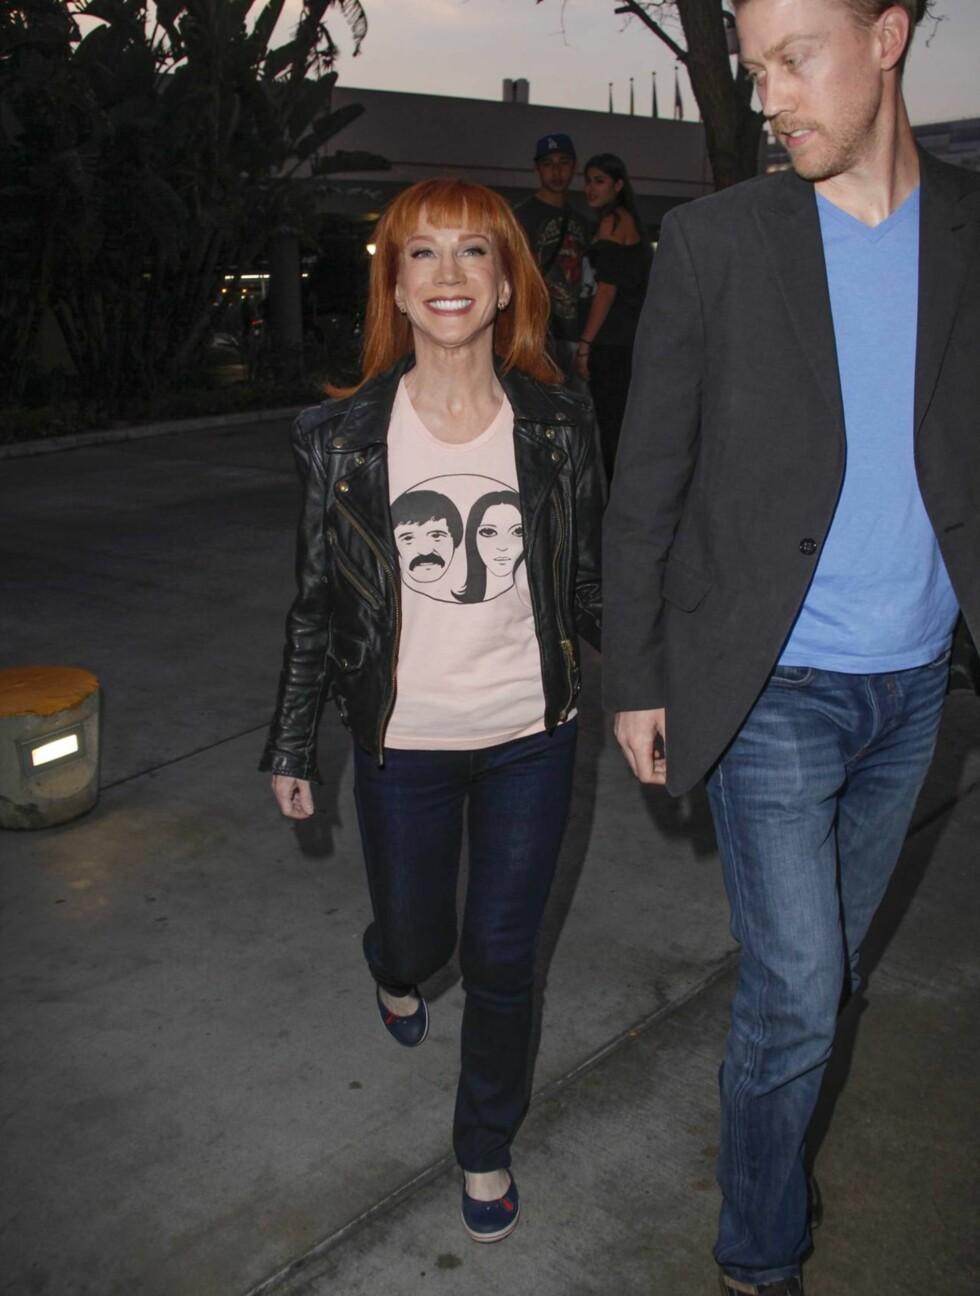 BOYTOY: Kathy Griffin (52) tok med sin 19 år yngre kjæreste Randy Bick på rockekonsert. Foto: All Over Press